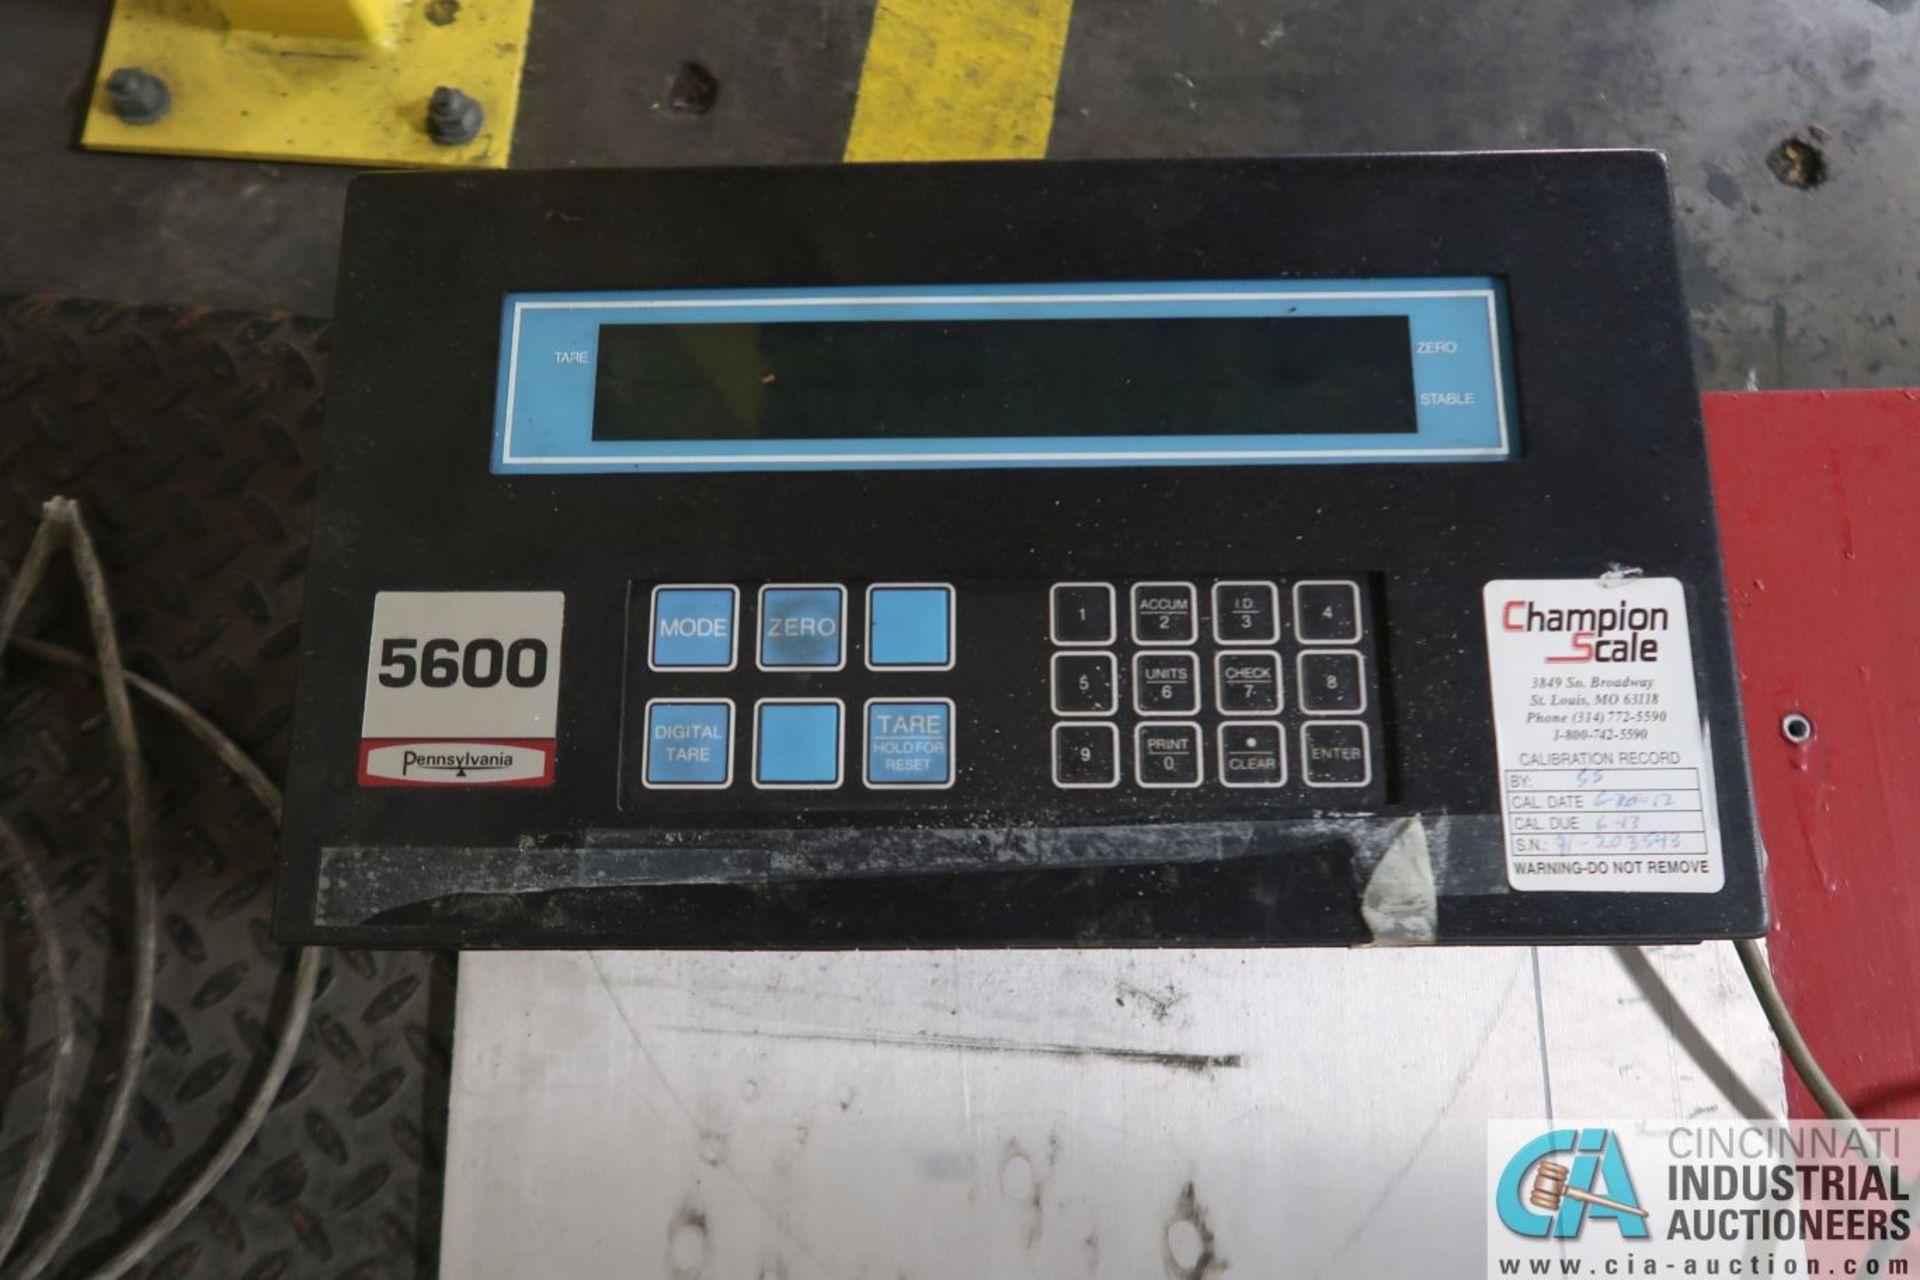 "5,000 LB. CAPACITY PENNSYLVANIA MDOEL 6600 48"" X 48"" PLATFORM SCALE WITH PENNSYLVANIA MODEL 5600 - Image 2 of 3"